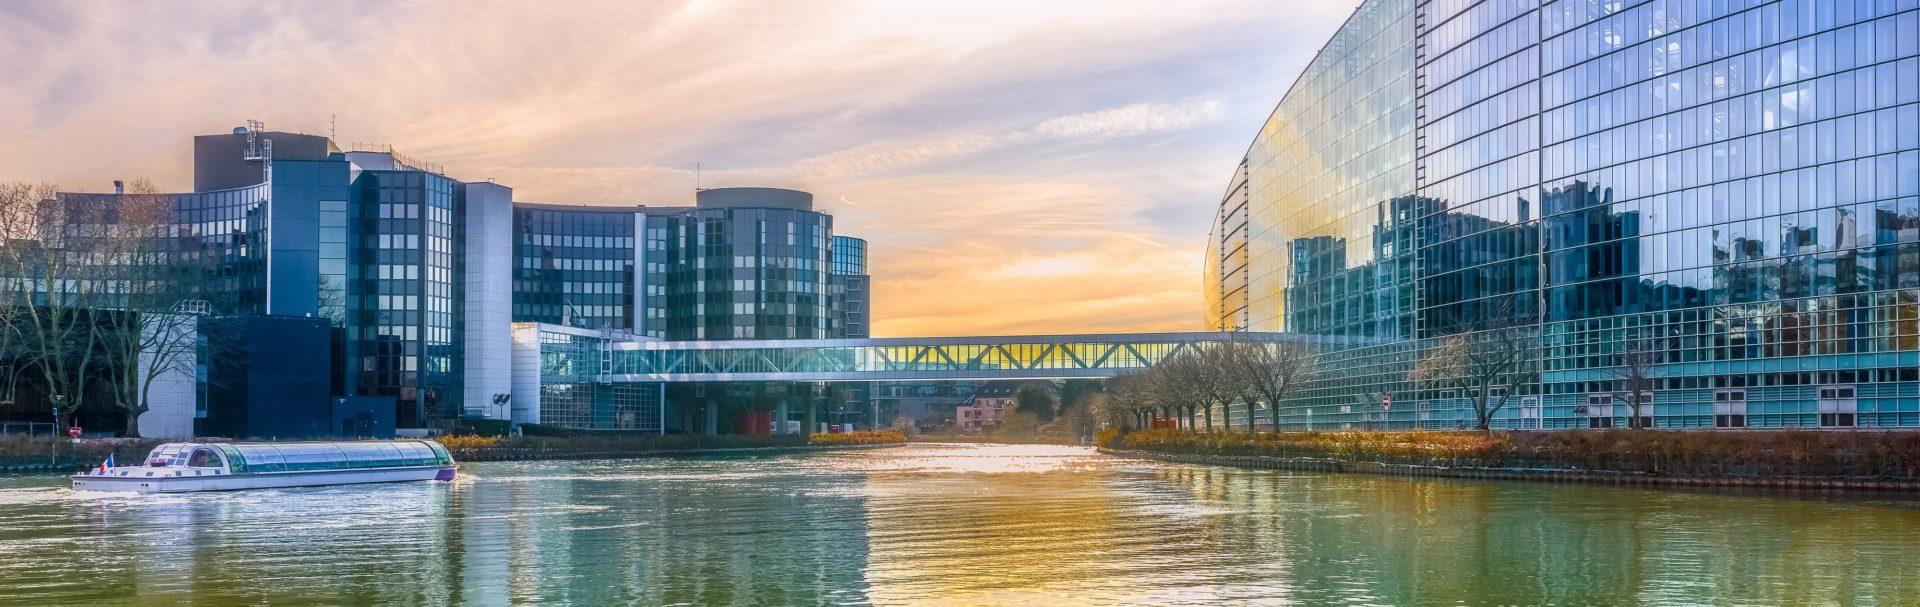 Agence Web à Strasbourg